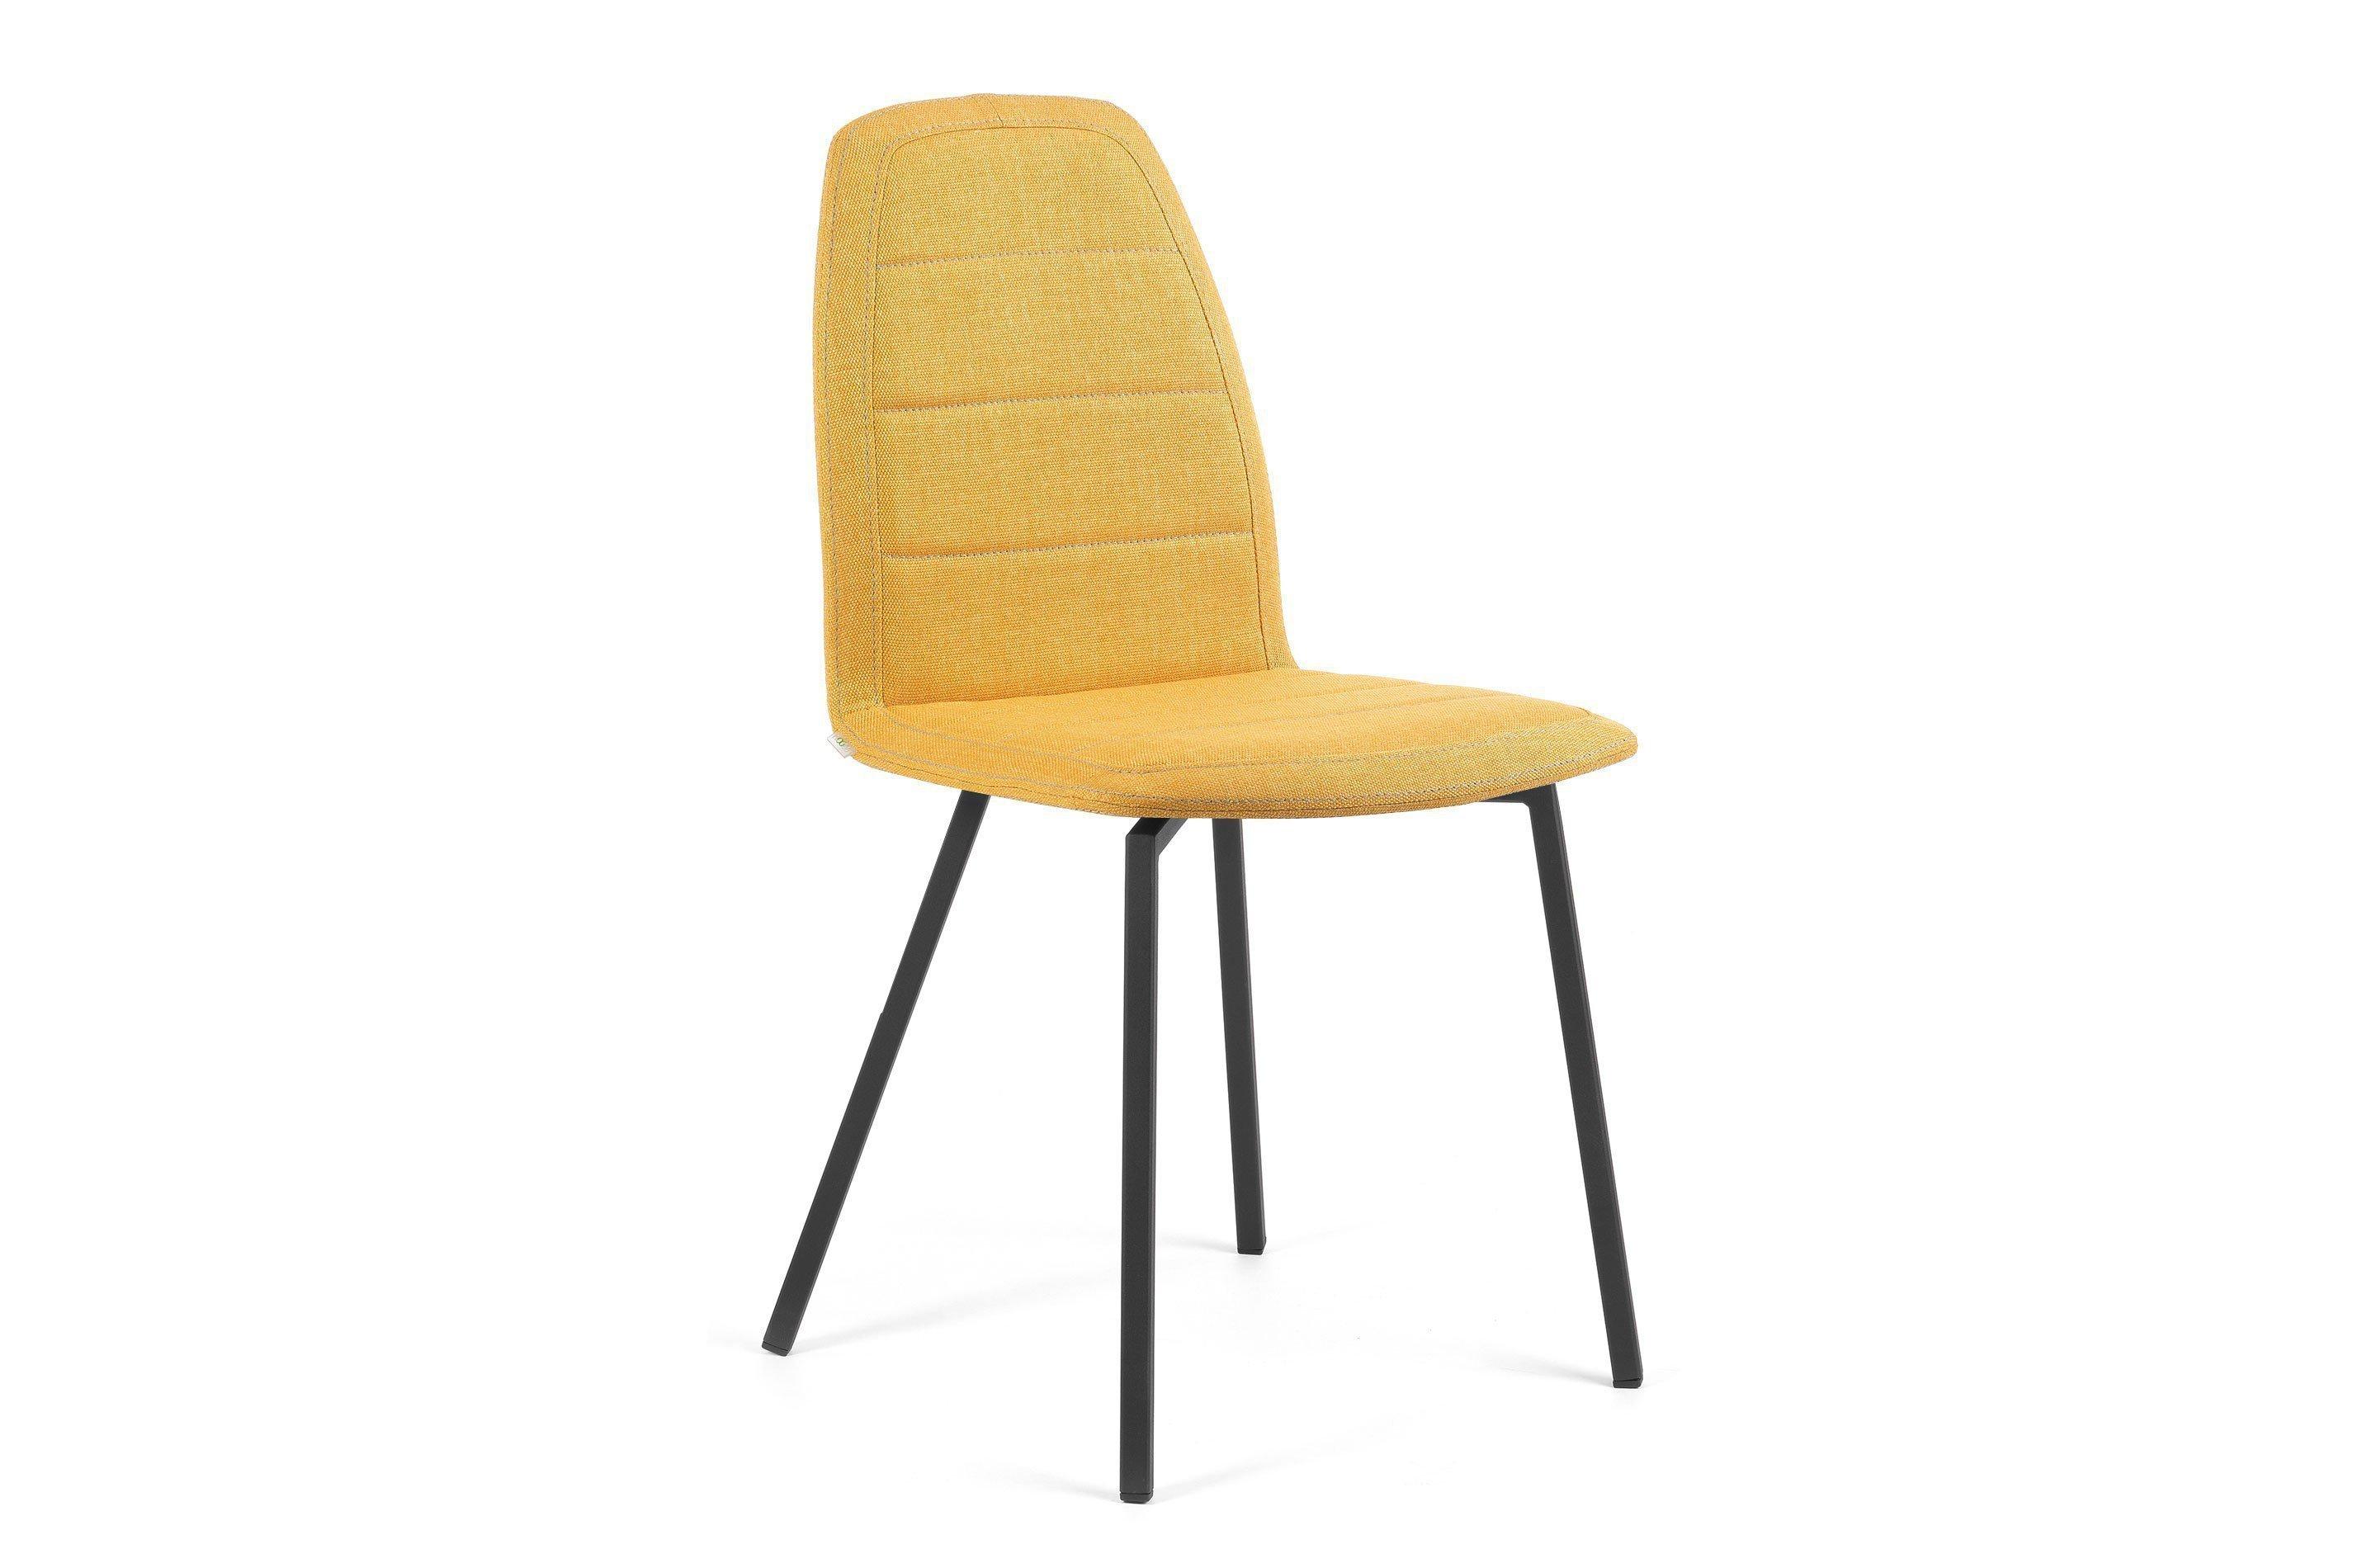 mobitec stuhl mood 12 uni yellow metall m bel letz ihr online shop. Black Bedroom Furniture Sets. Home Design Ideas